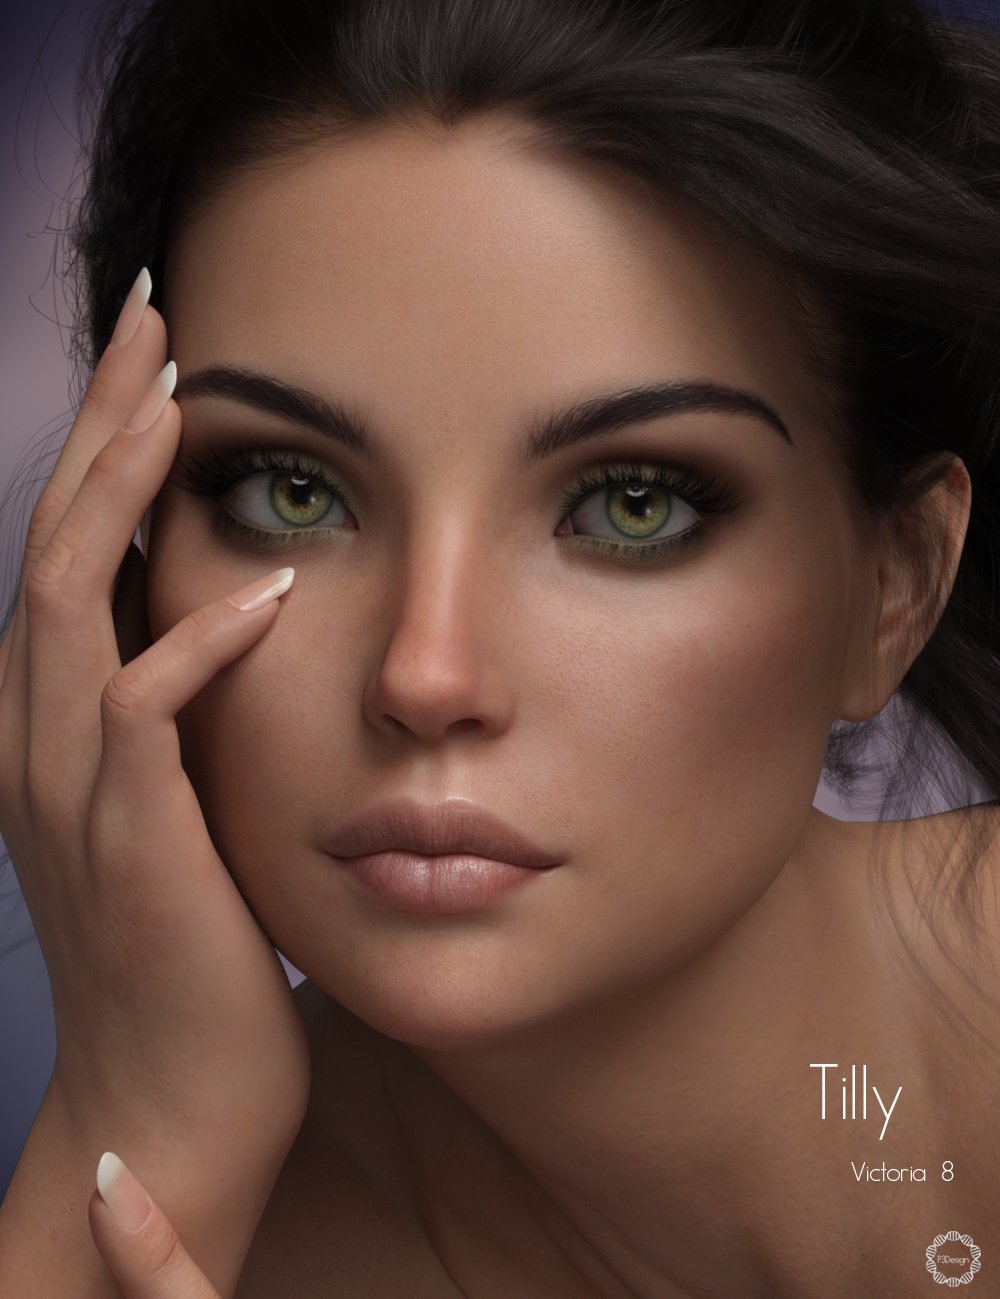 P3D Tilly for Victoria 8 by: P3Design, 3D Models by Daz 3D